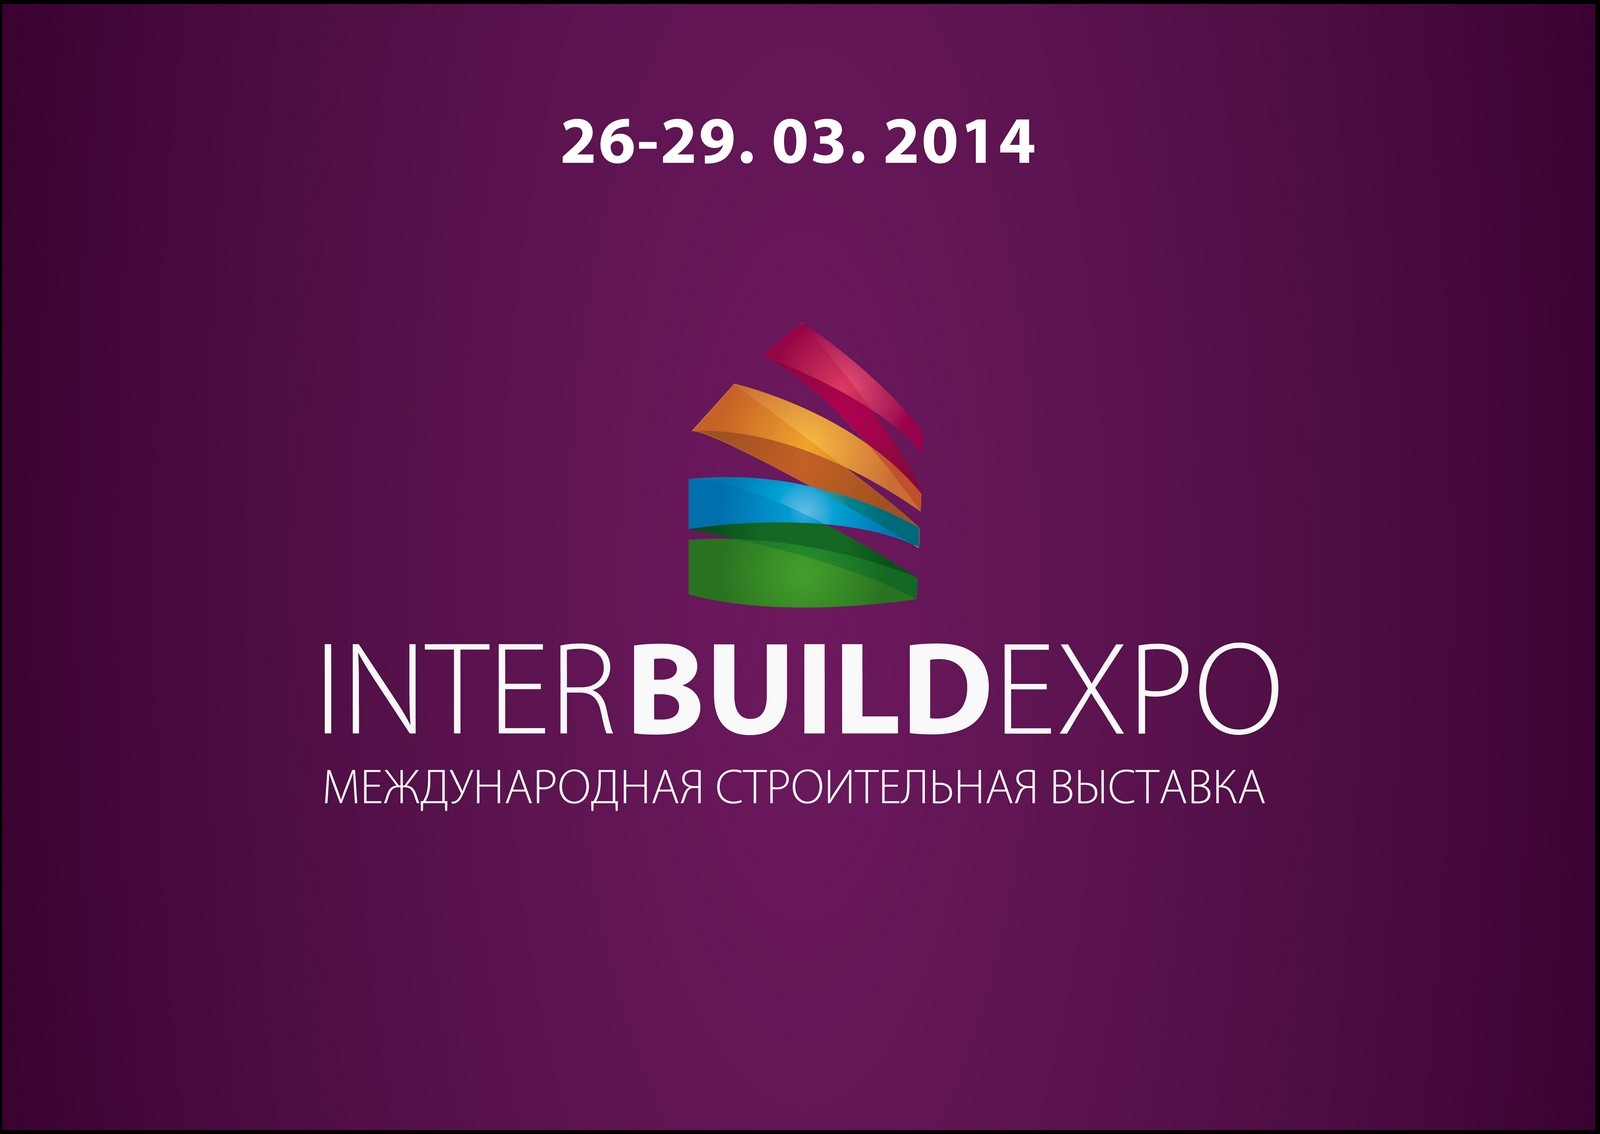 INTERBUILDEXPO 2014